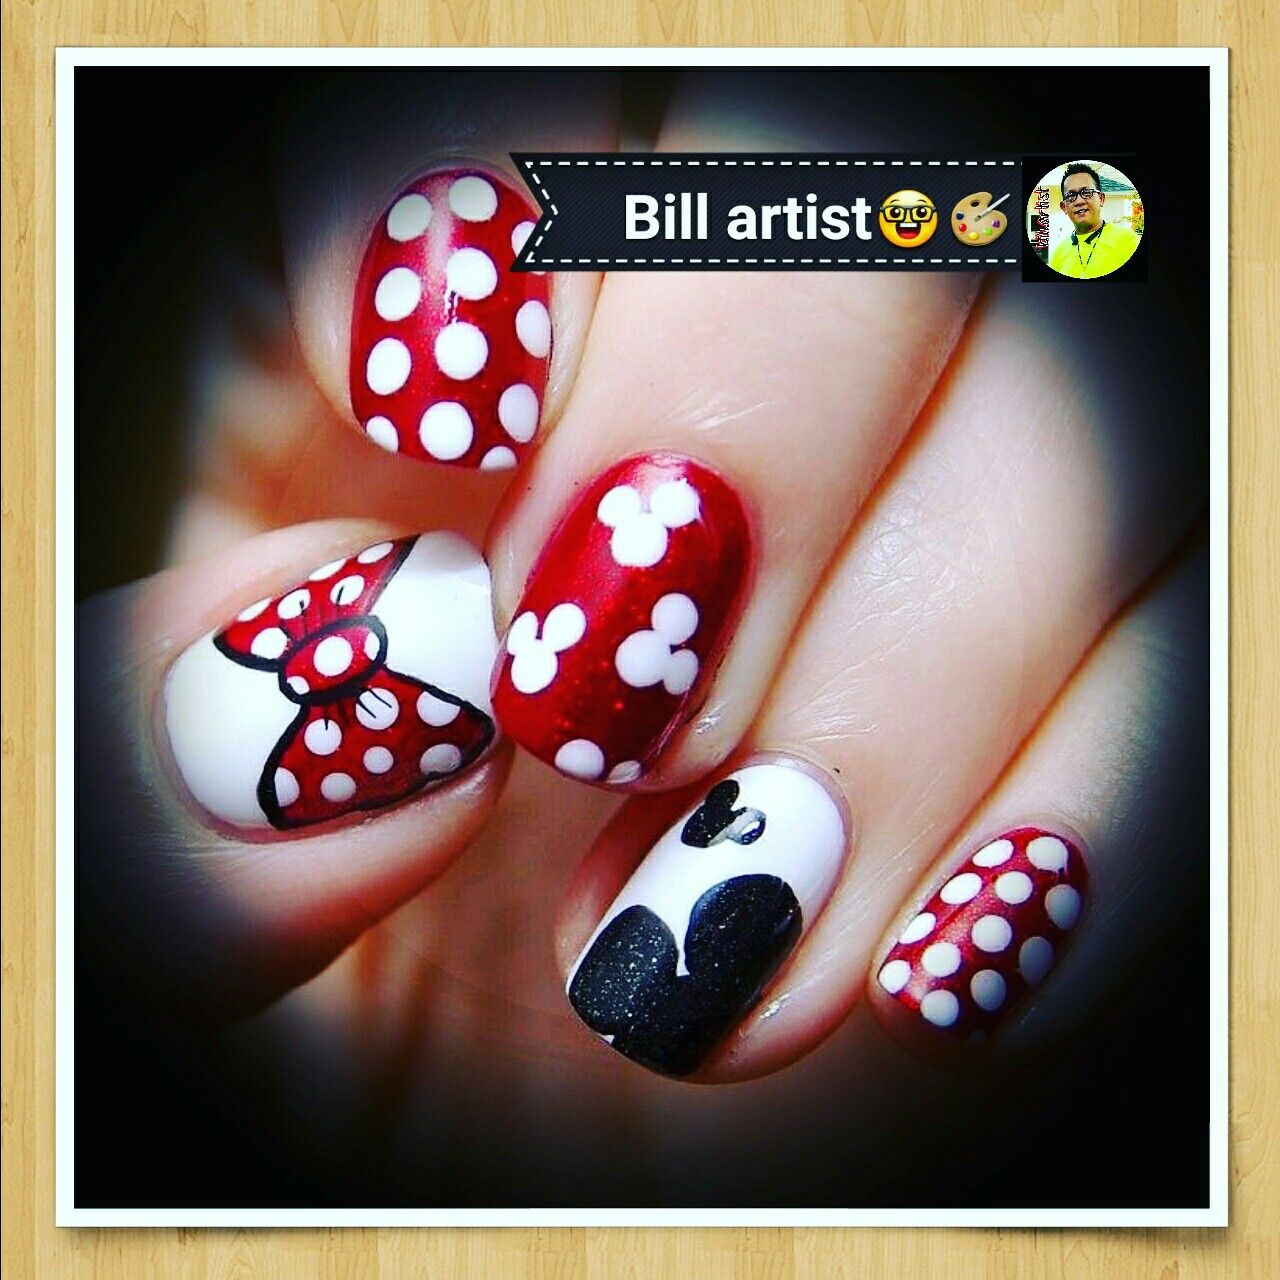 nailsartist#bill_cali#billartist###   Bill artist Cali   Pinterest ...